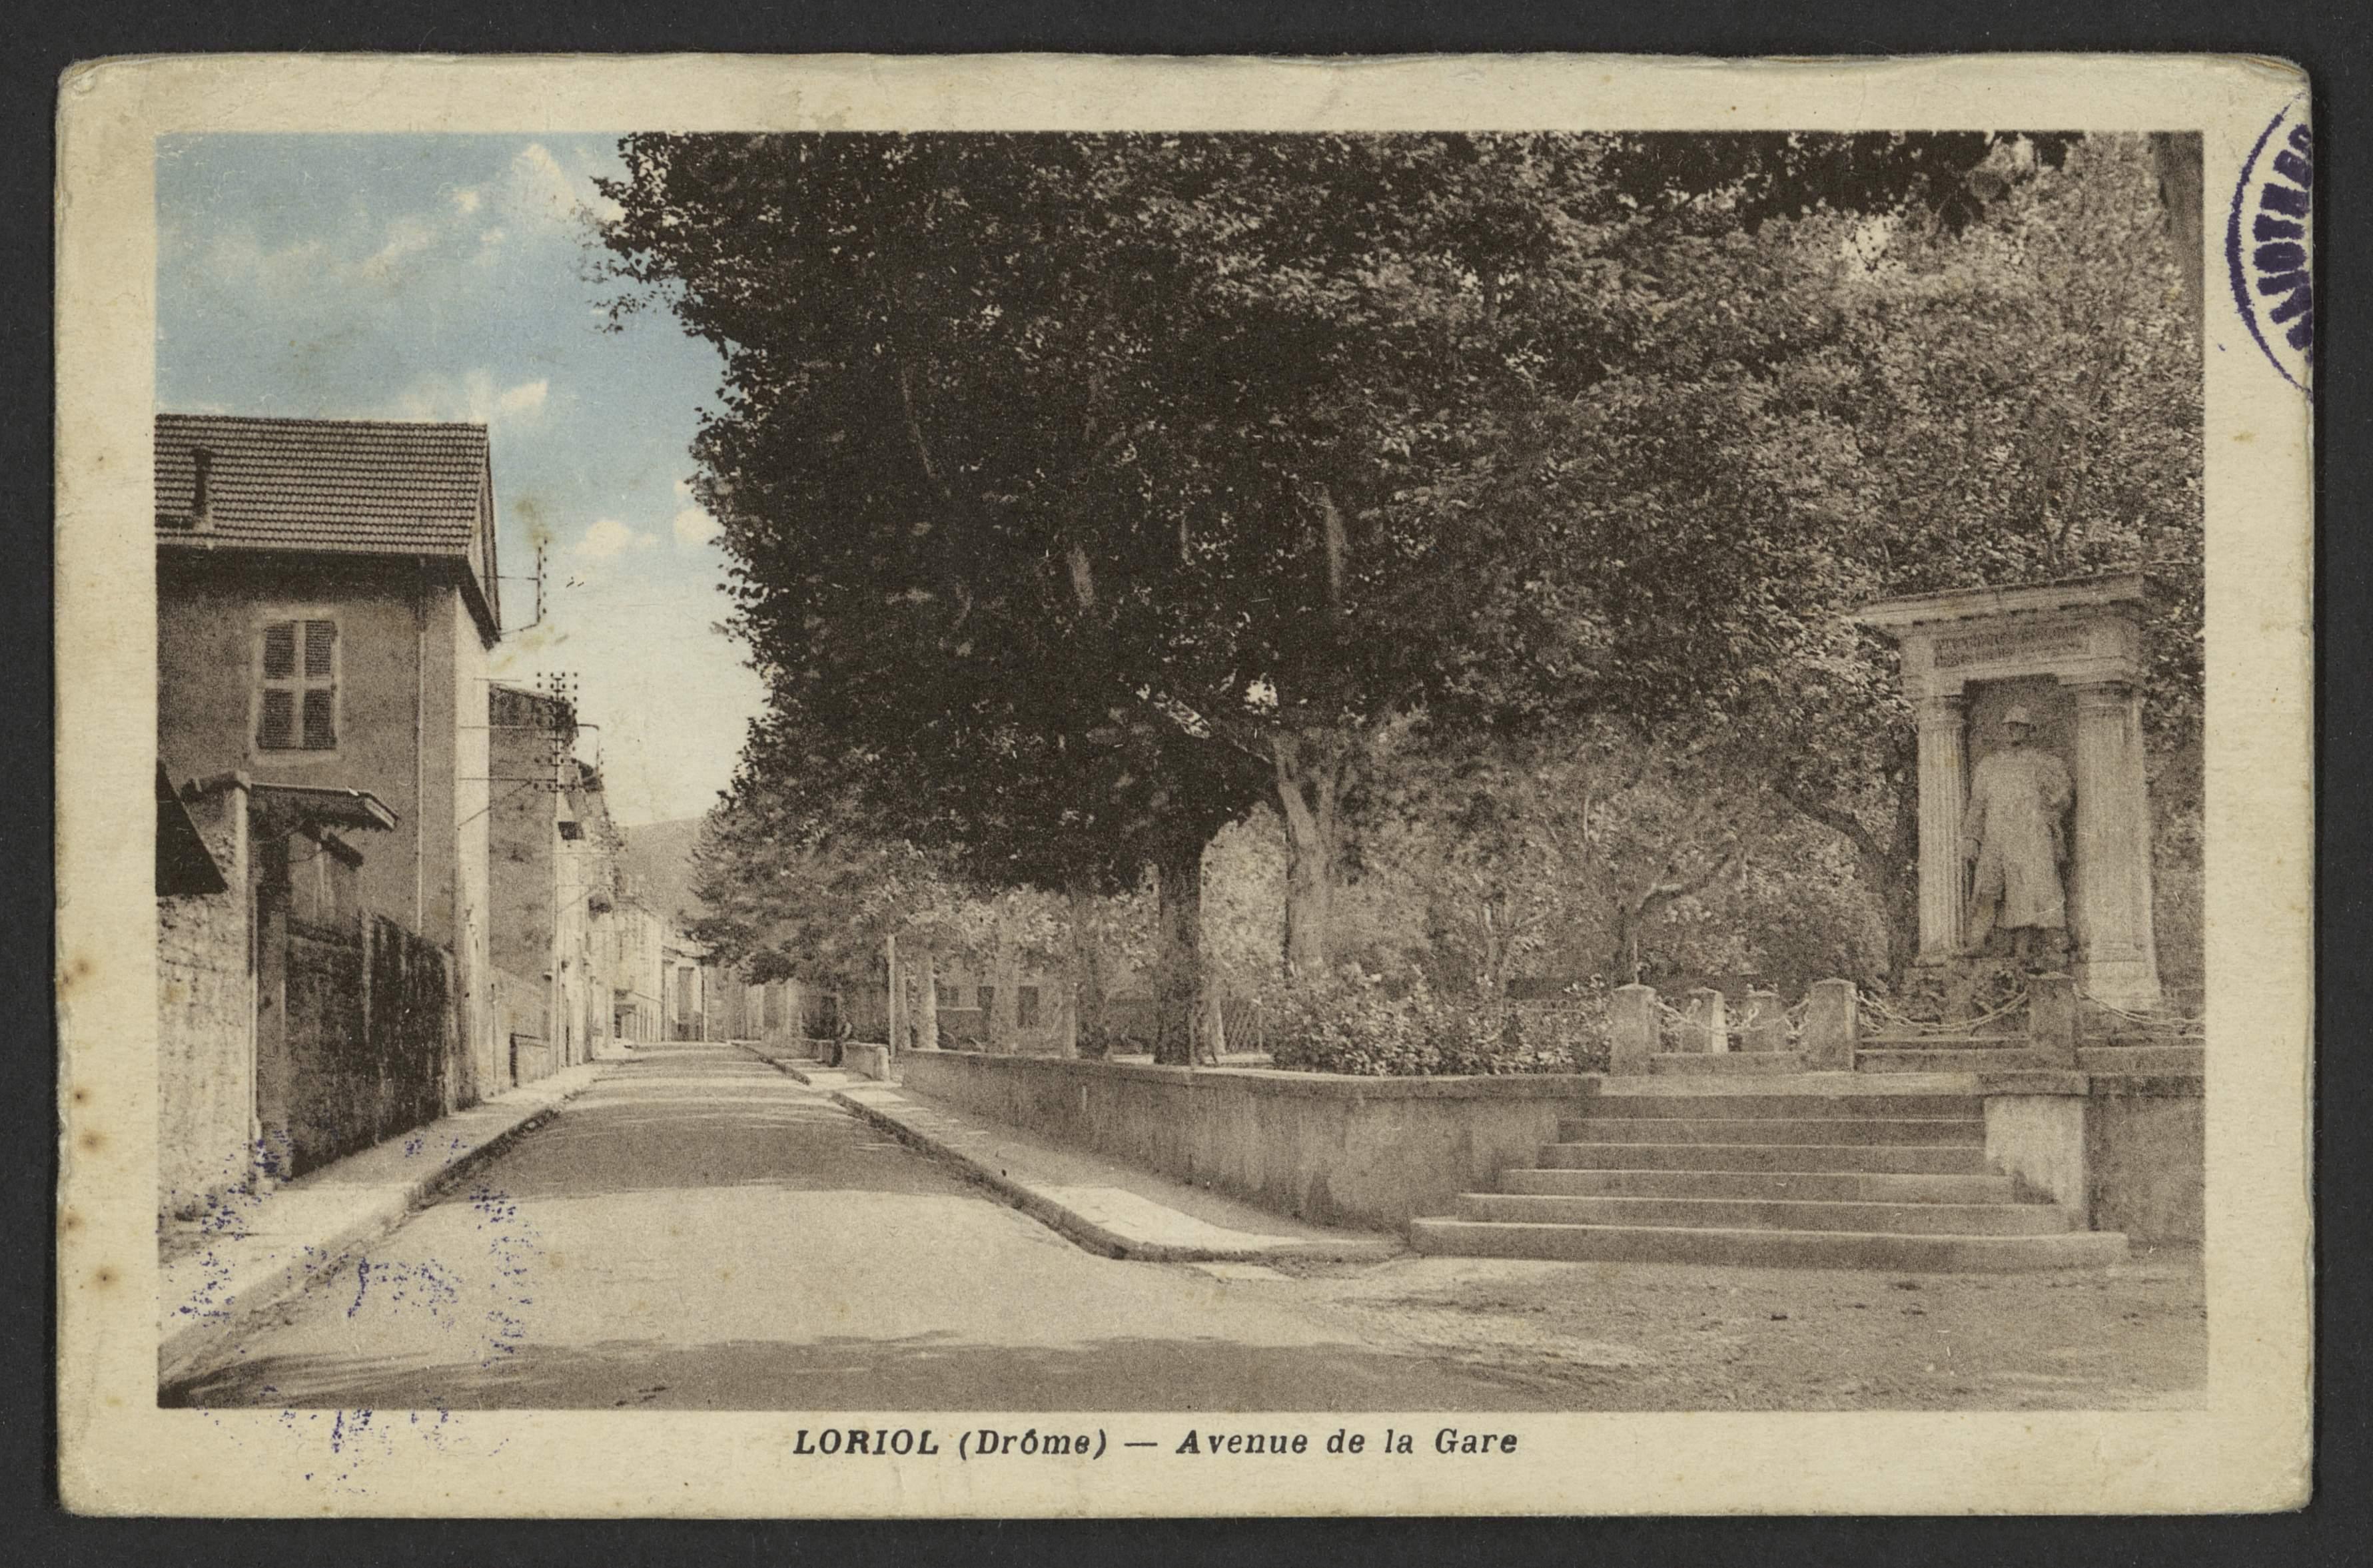 Loriol (Drôme) - Avenue de la Gare